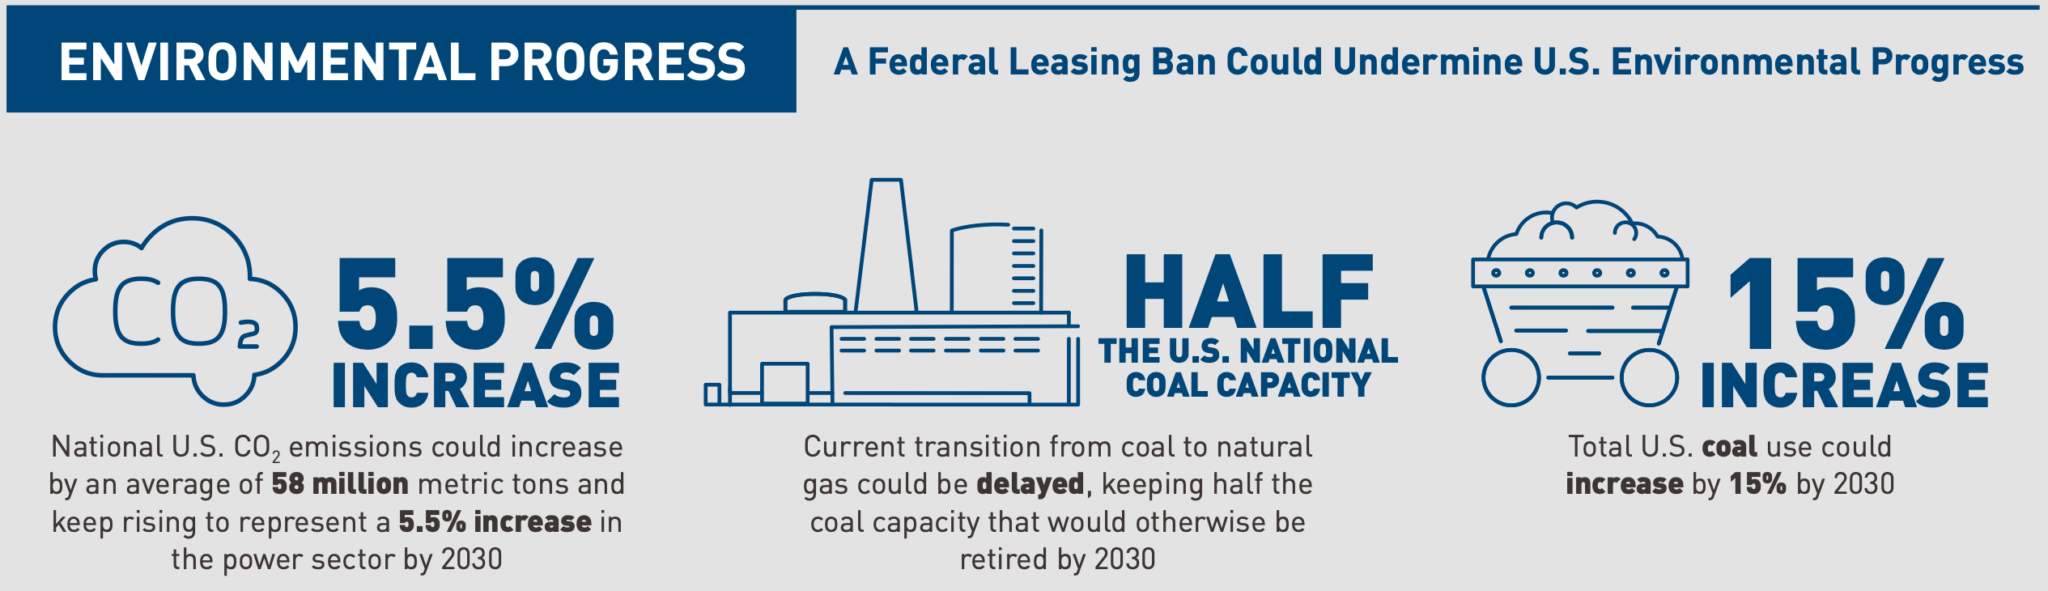 Federal Leasing Ban